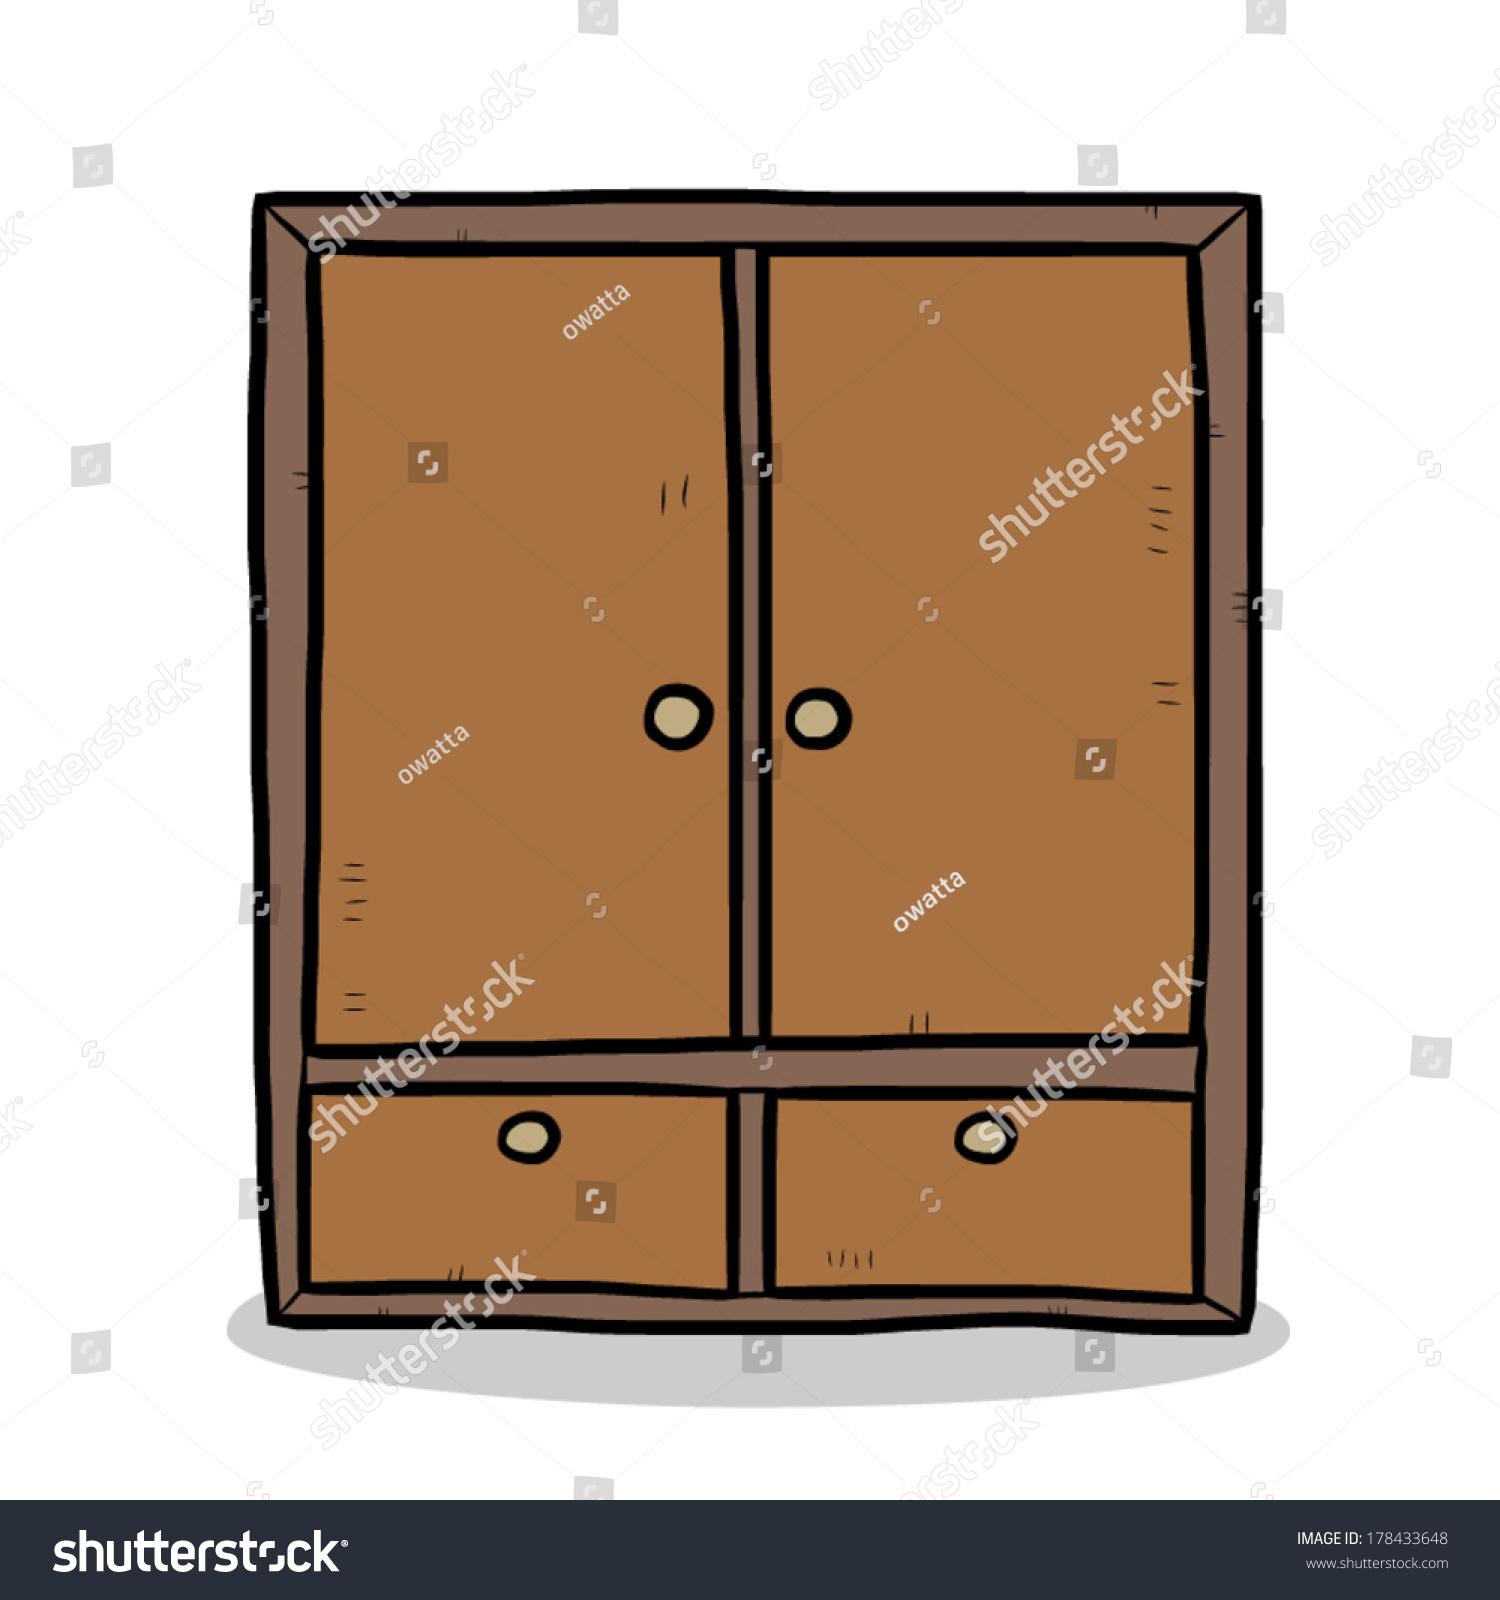 Empty Kitchen Cupboard: Old Kitchen Cupboard. Kitchen Cabinets Cupboards Drawers